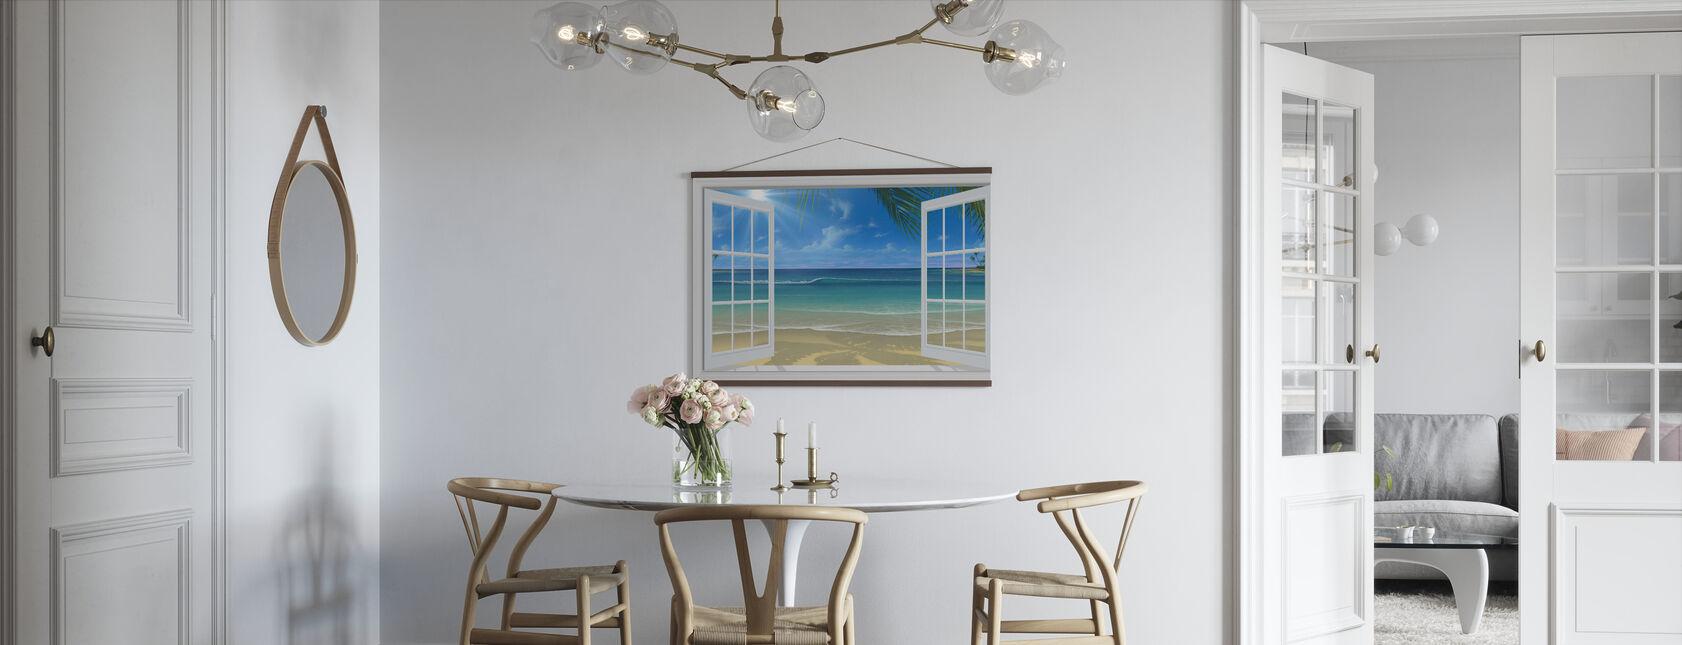 Auringonpaiste ikkunan läpi - Juliste - Keittiö